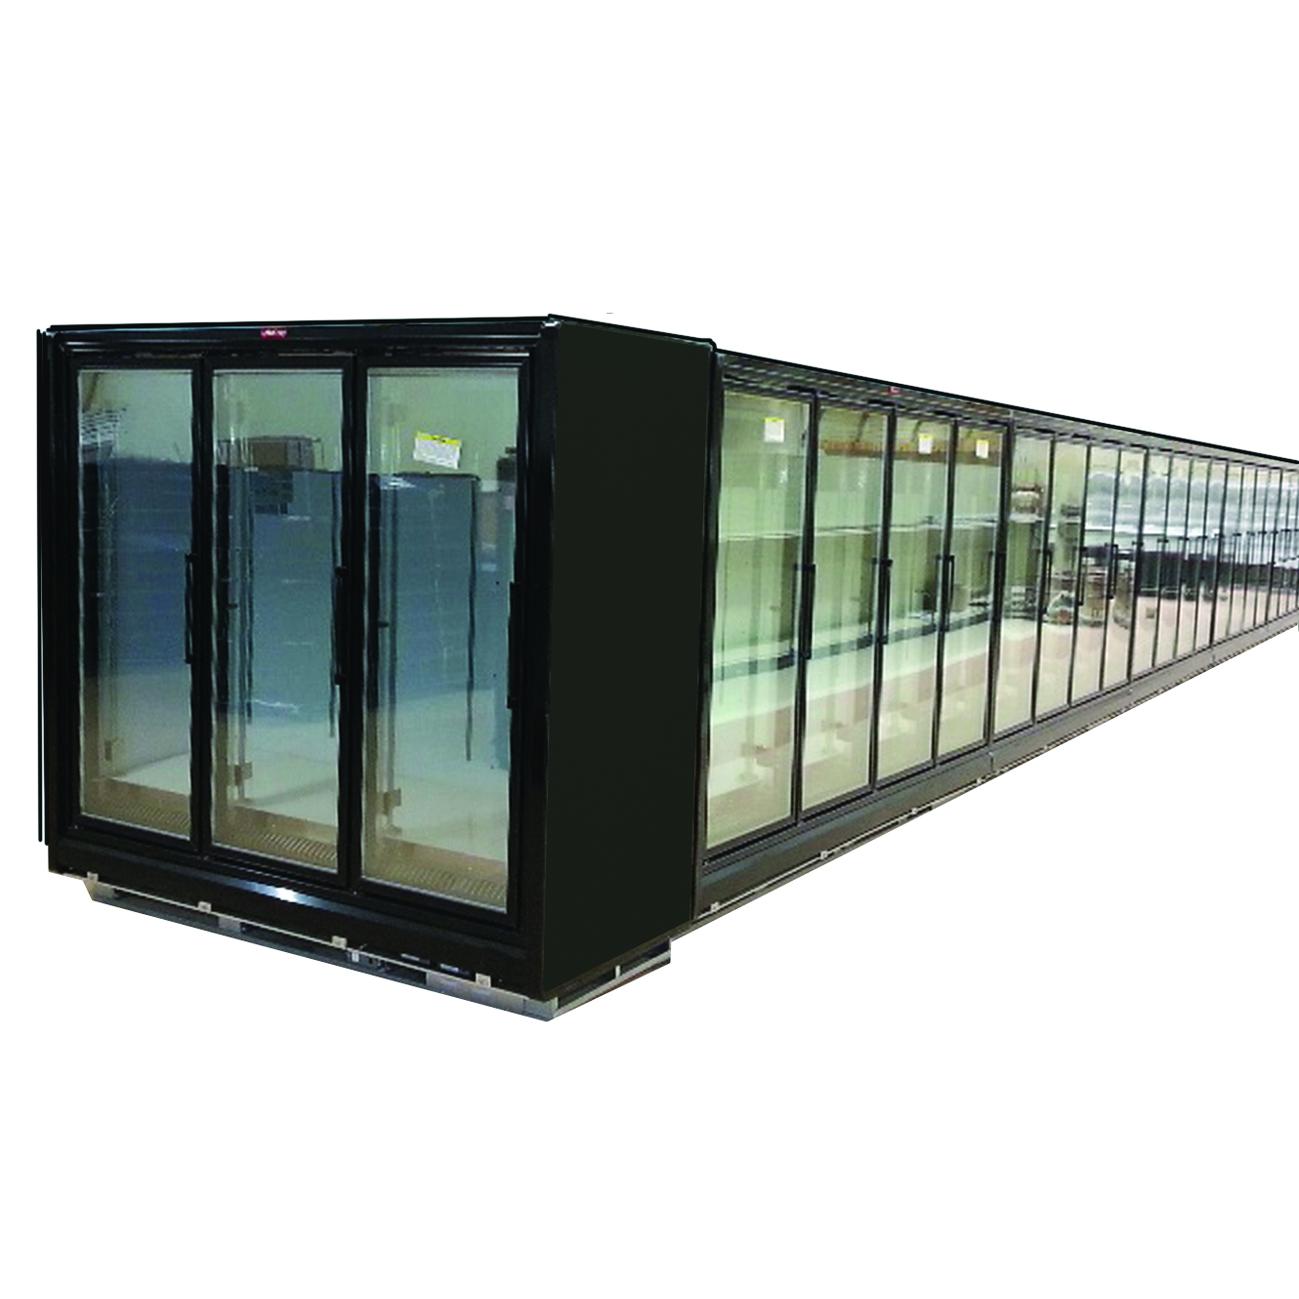 Howard-McCray RIN3-30-LED-B refrigerator, merchandiser